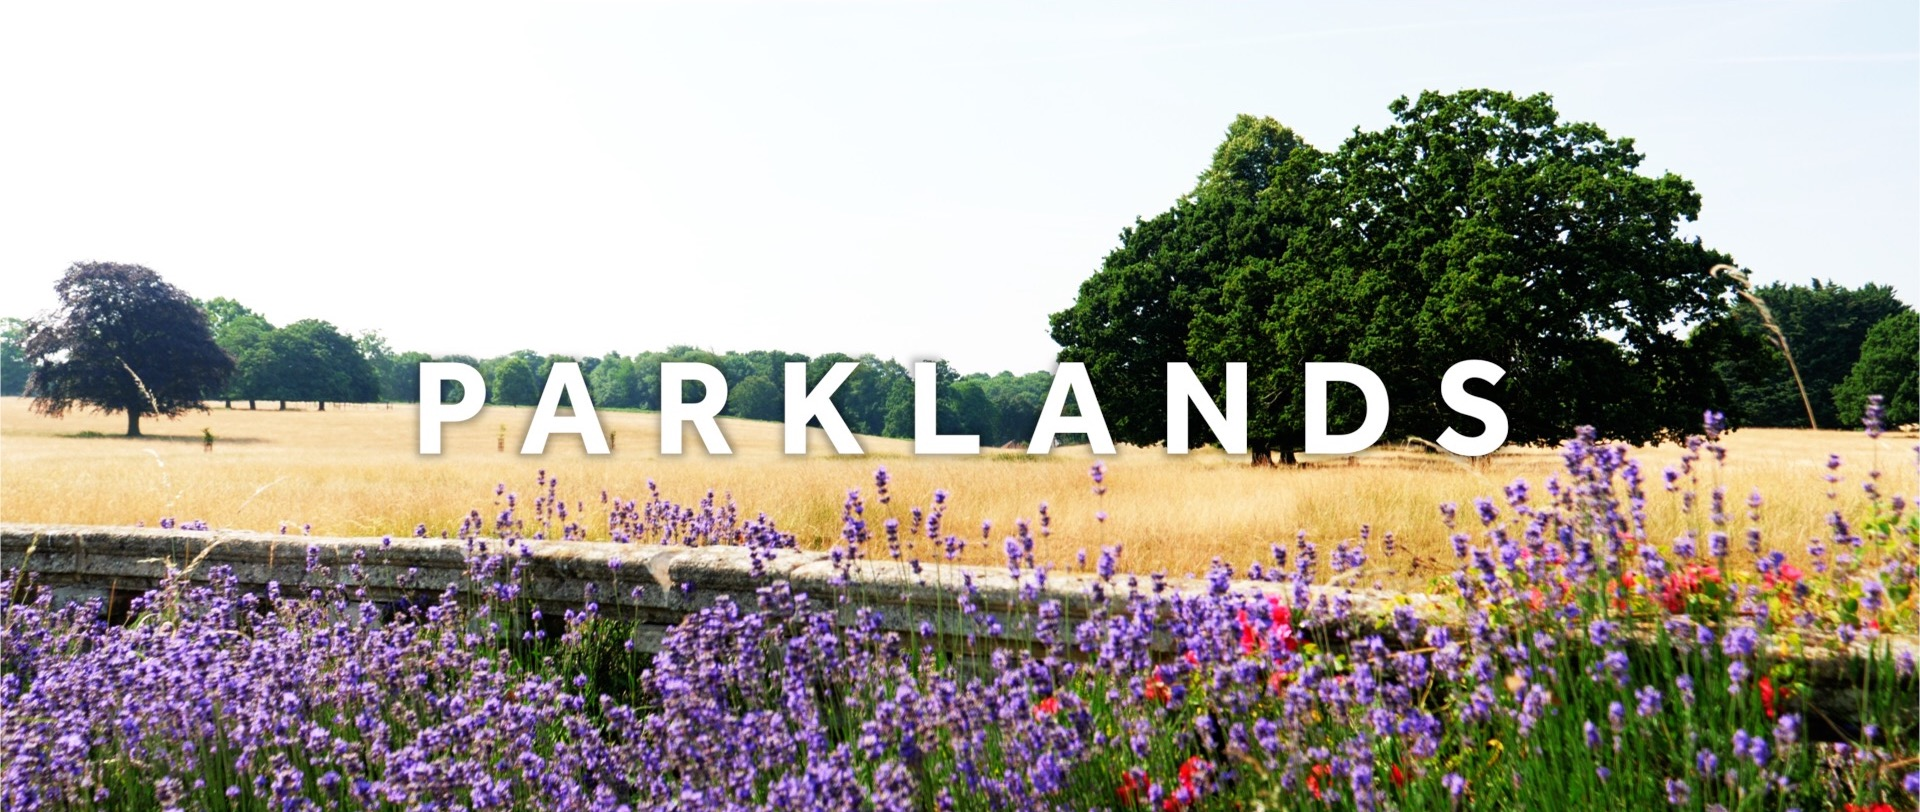 Parklands Summer Wedding Video